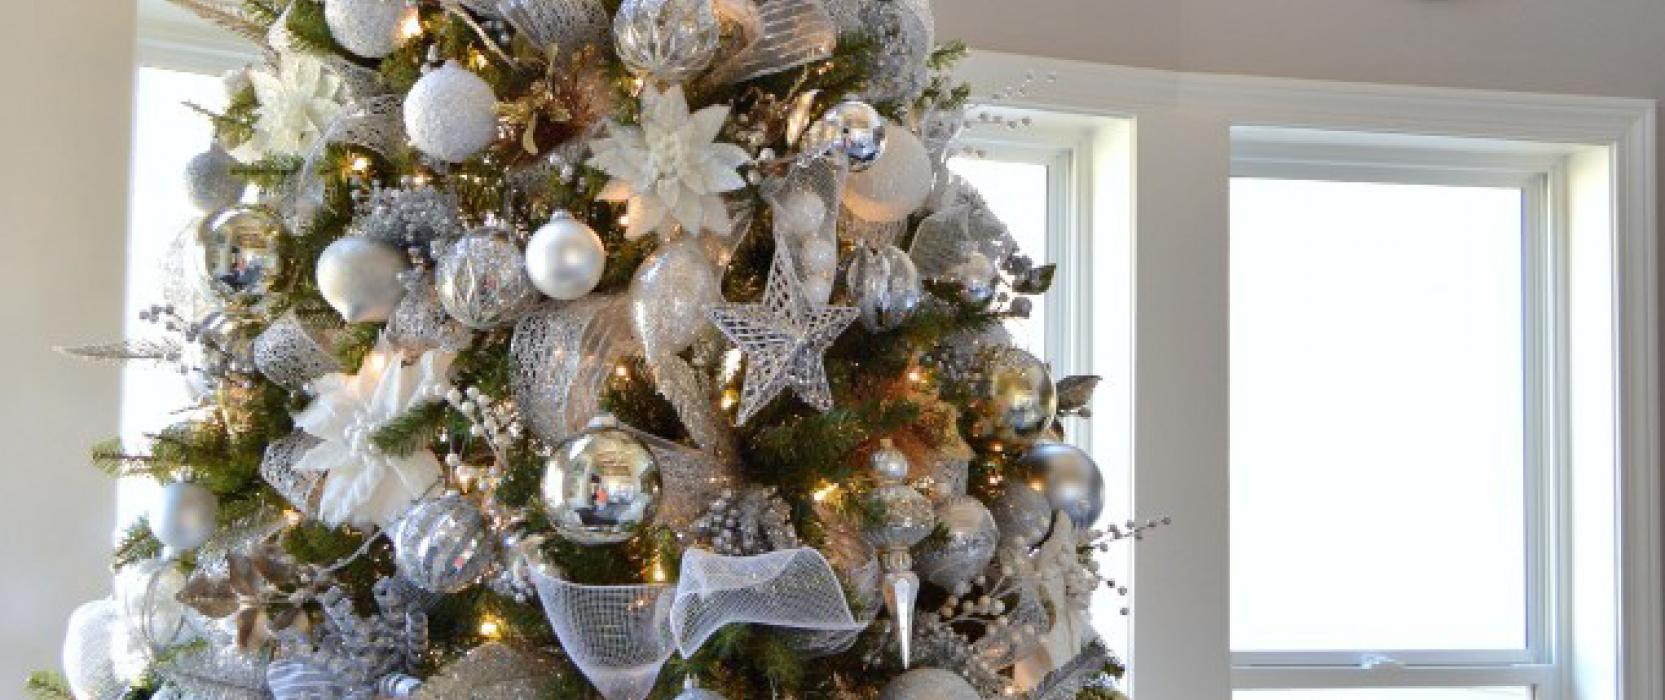 White Holiday Home Decor